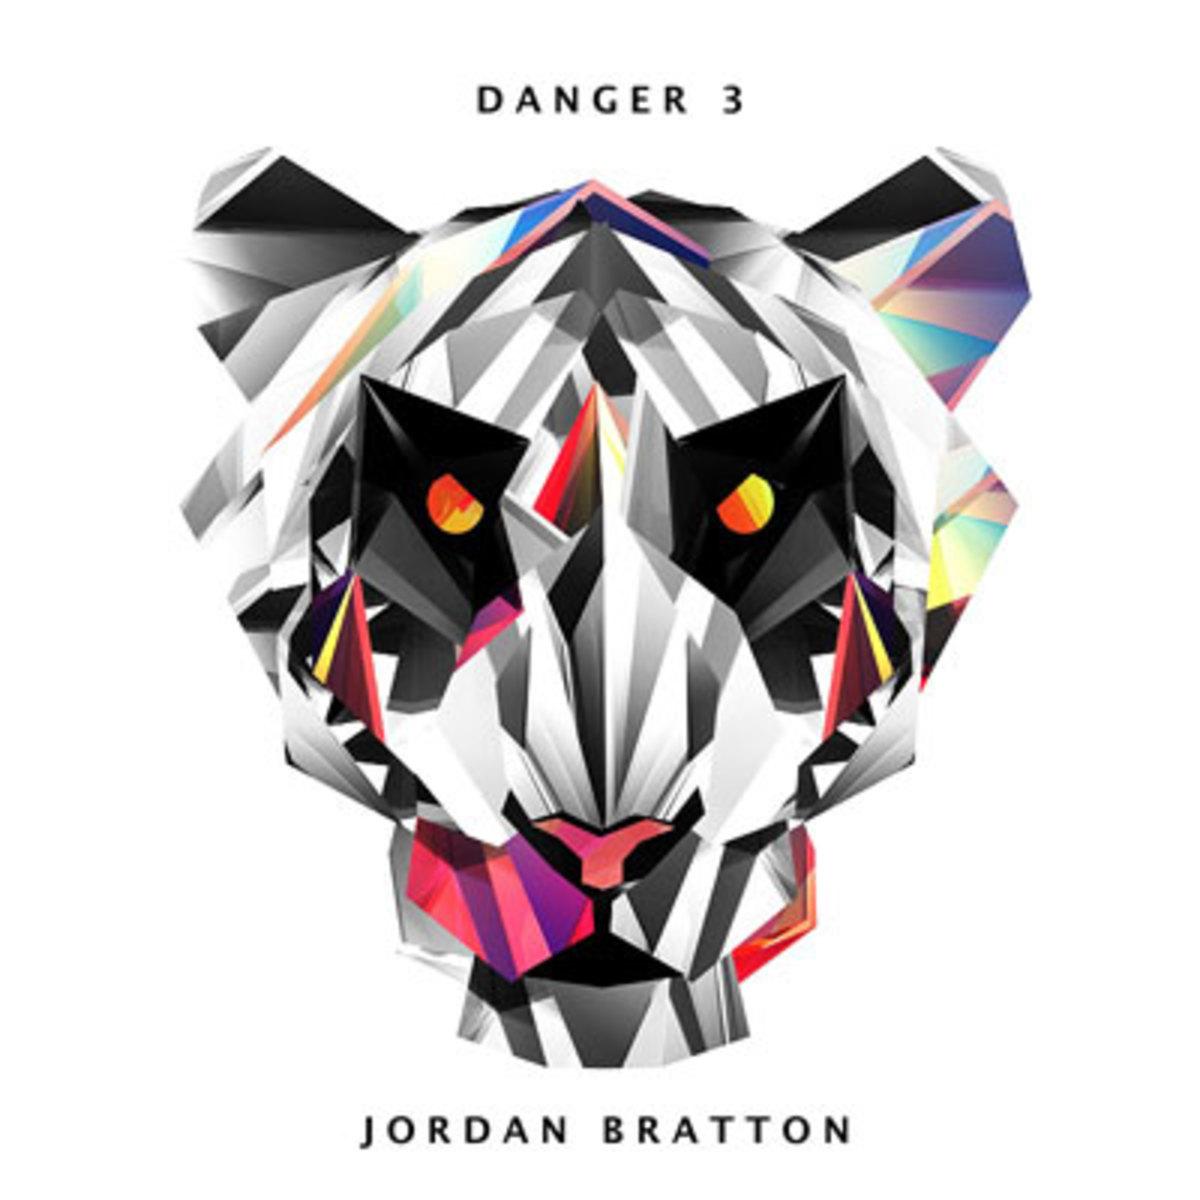 jordanbratton-danger3.jpg